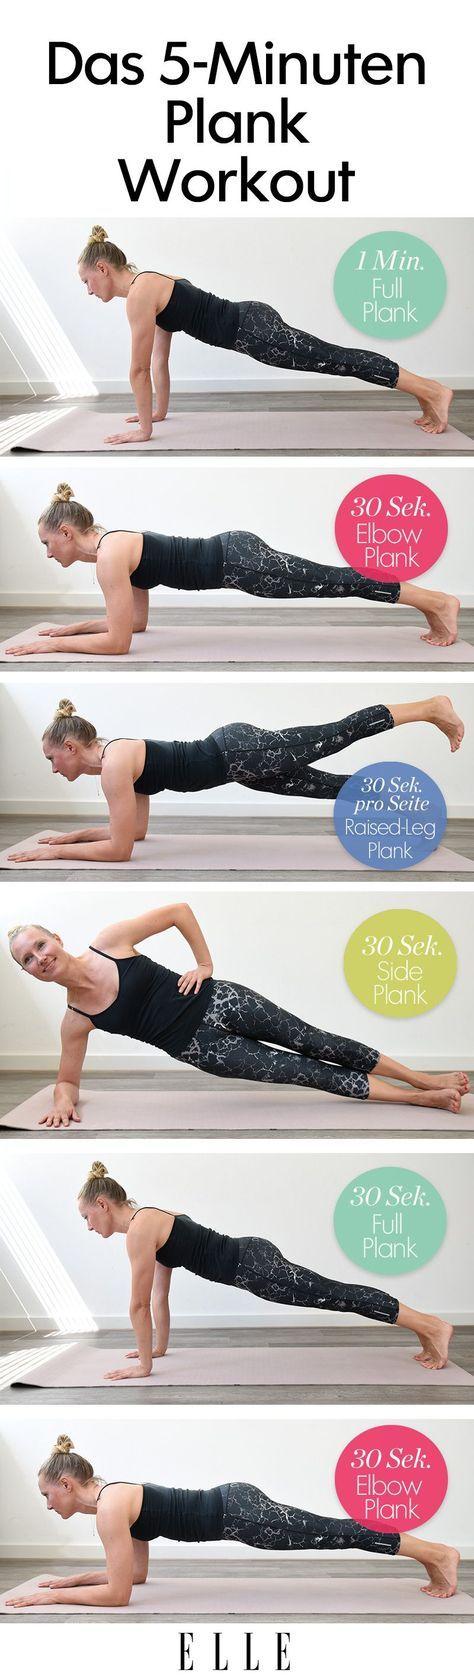 Badideen für frauen  best sport images on pinterest  exercise workouts yoga poses